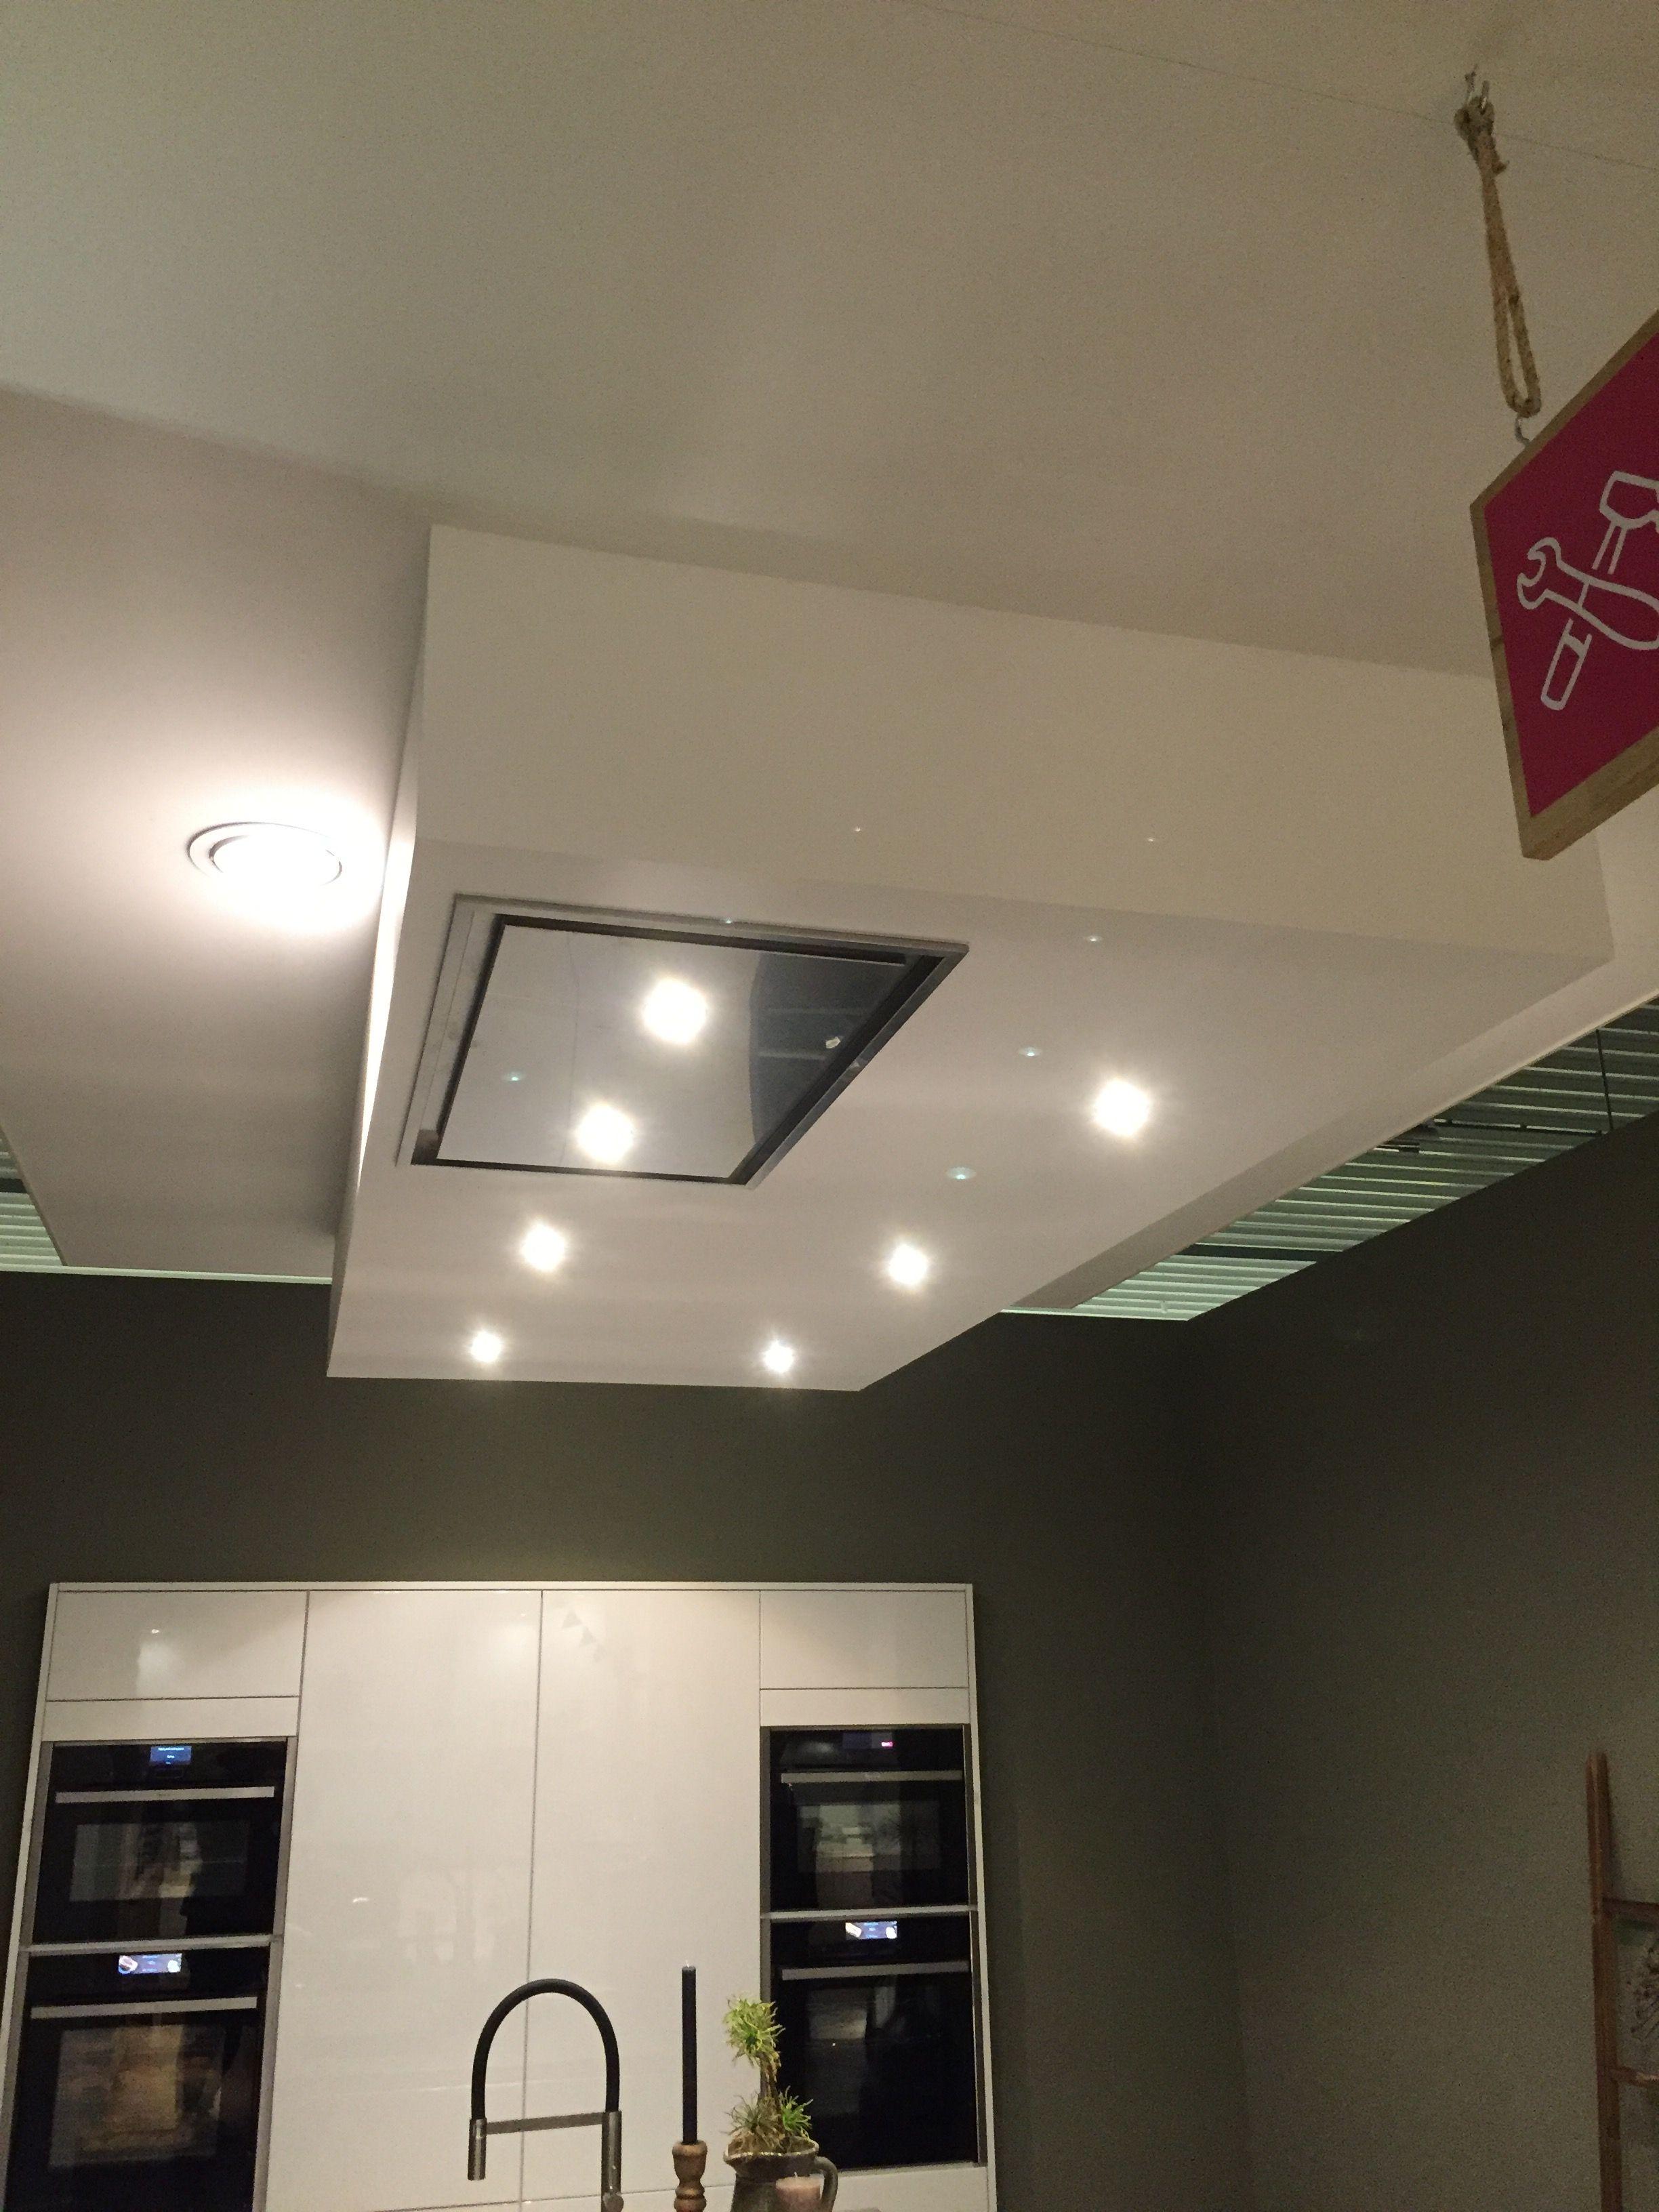 Verlaagd plafond en afzuigkap zoals besteld   Thijs en Nelleke ...